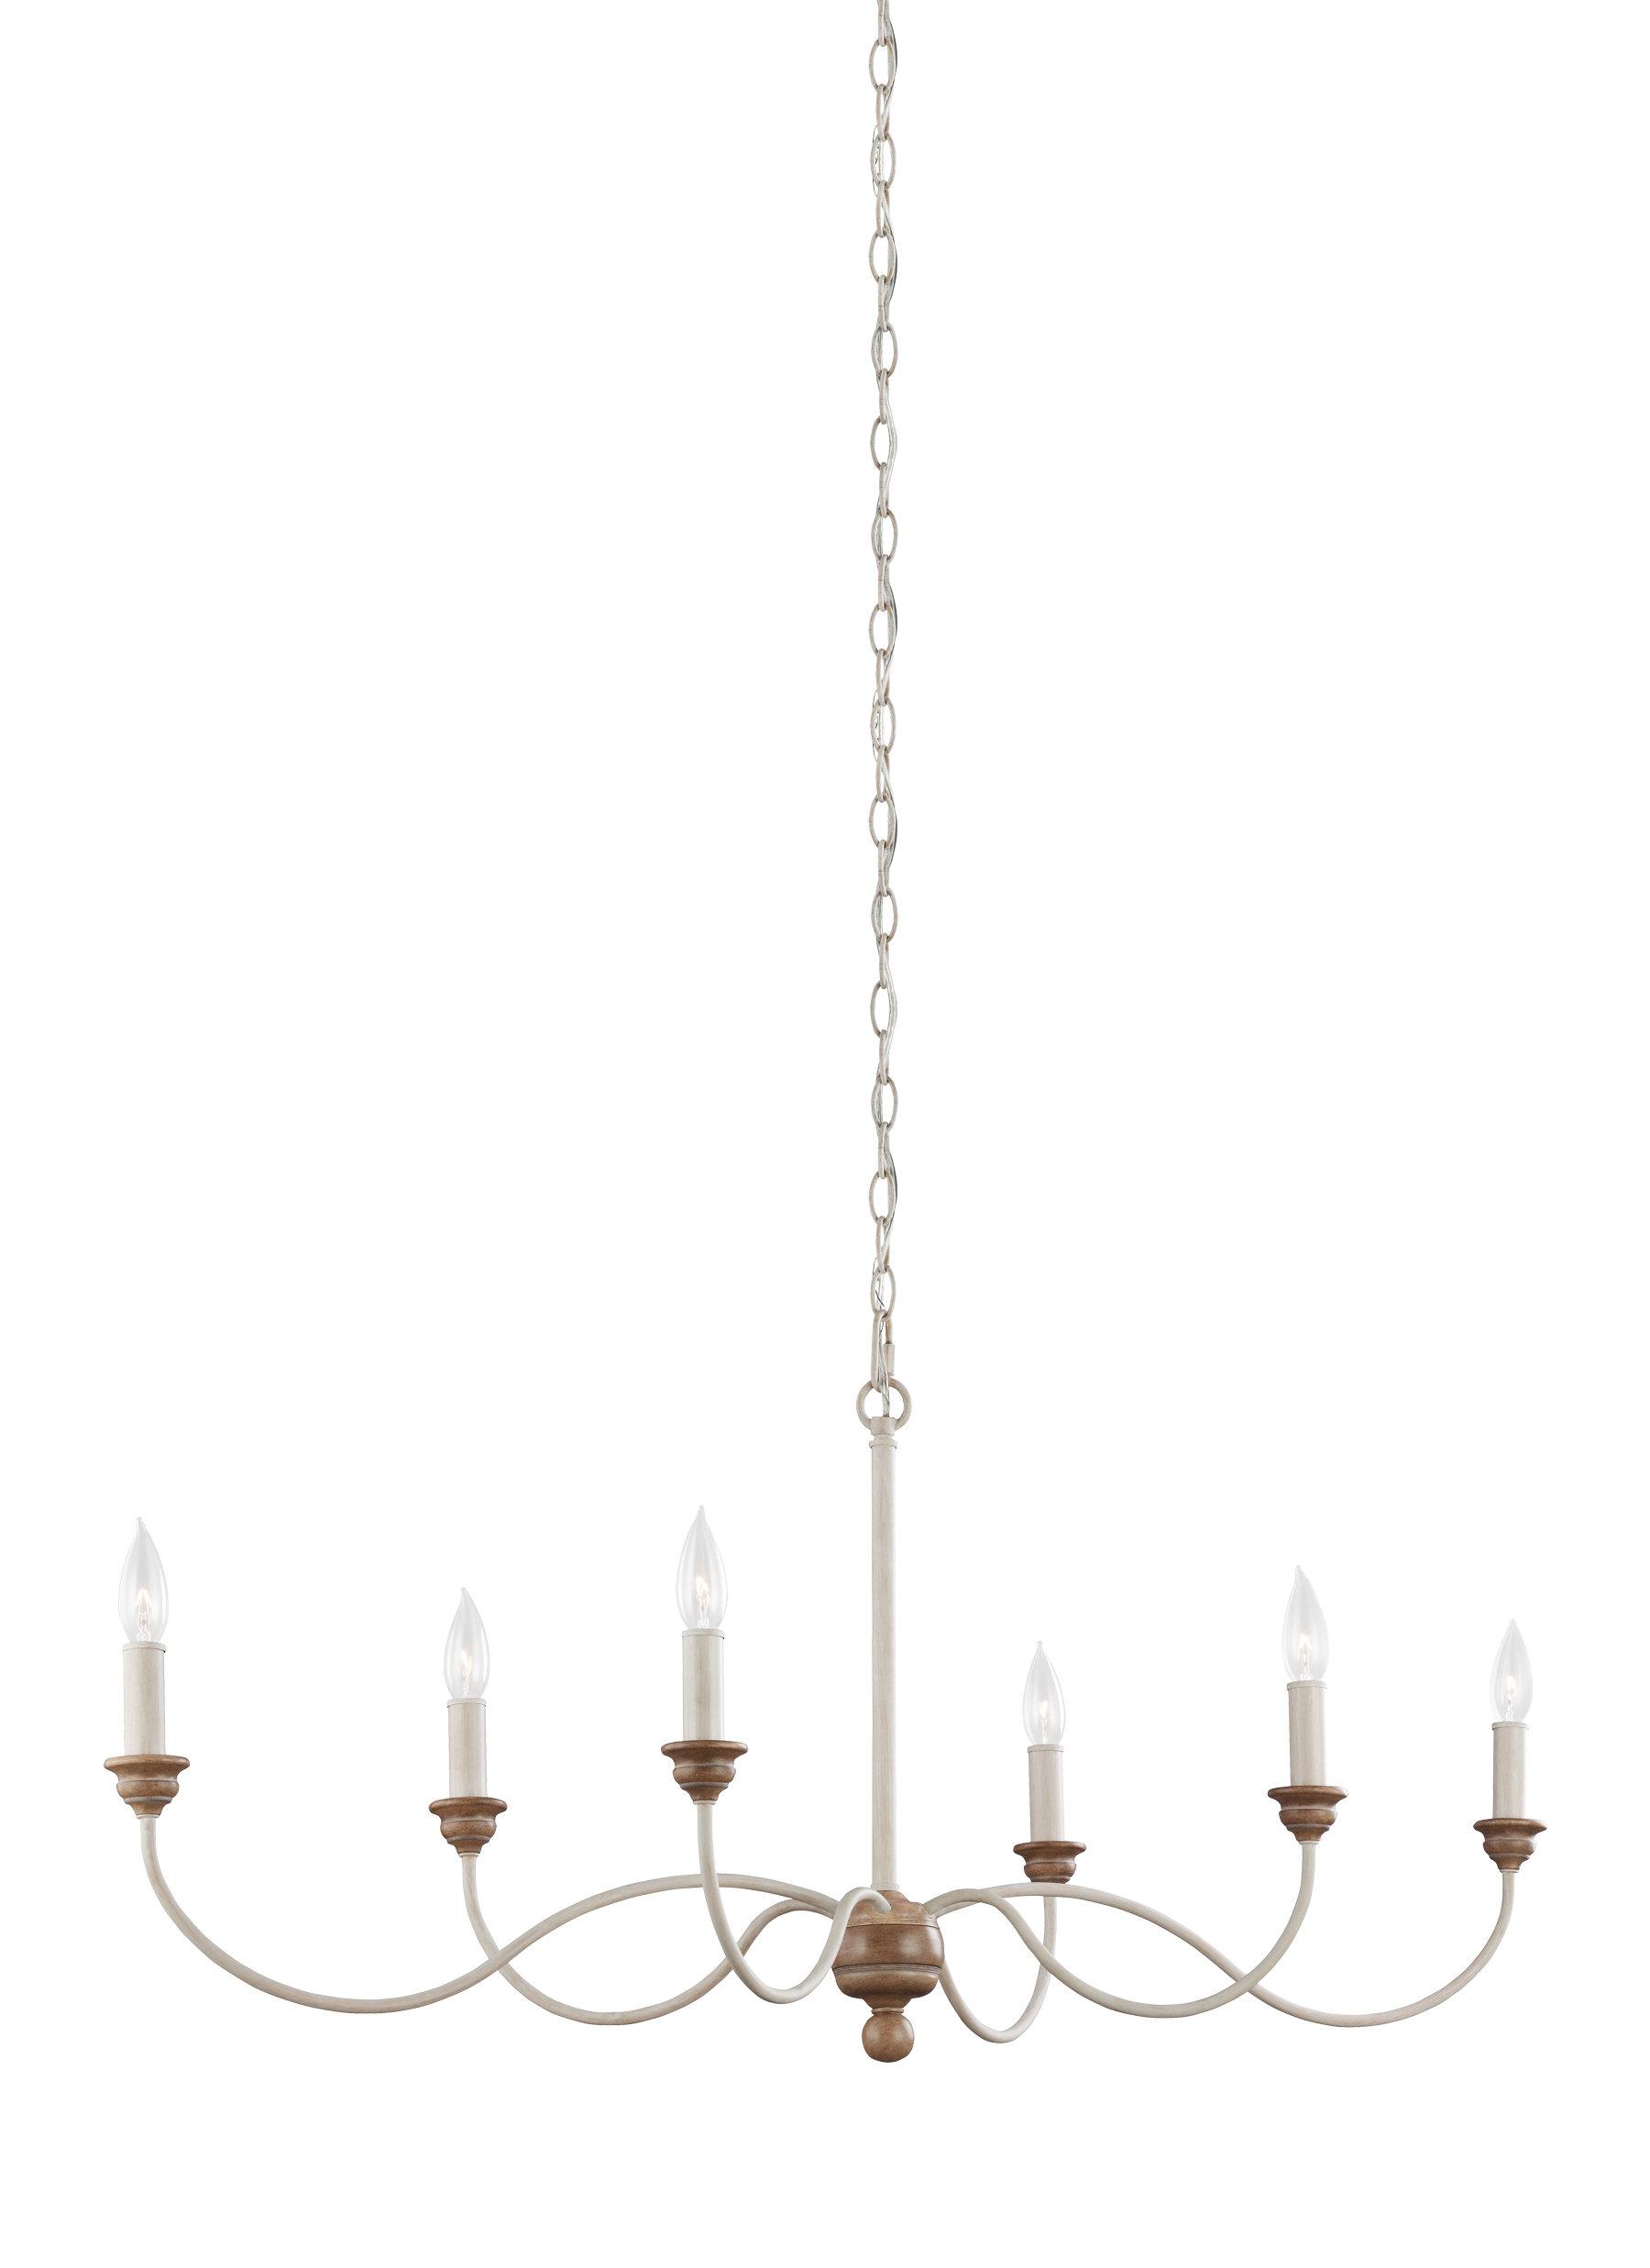 Sundberg 6 Light Candle Style Chandelier Regarding Diaz 6 Light Candle Style Chandeliers (View 19 of 30)